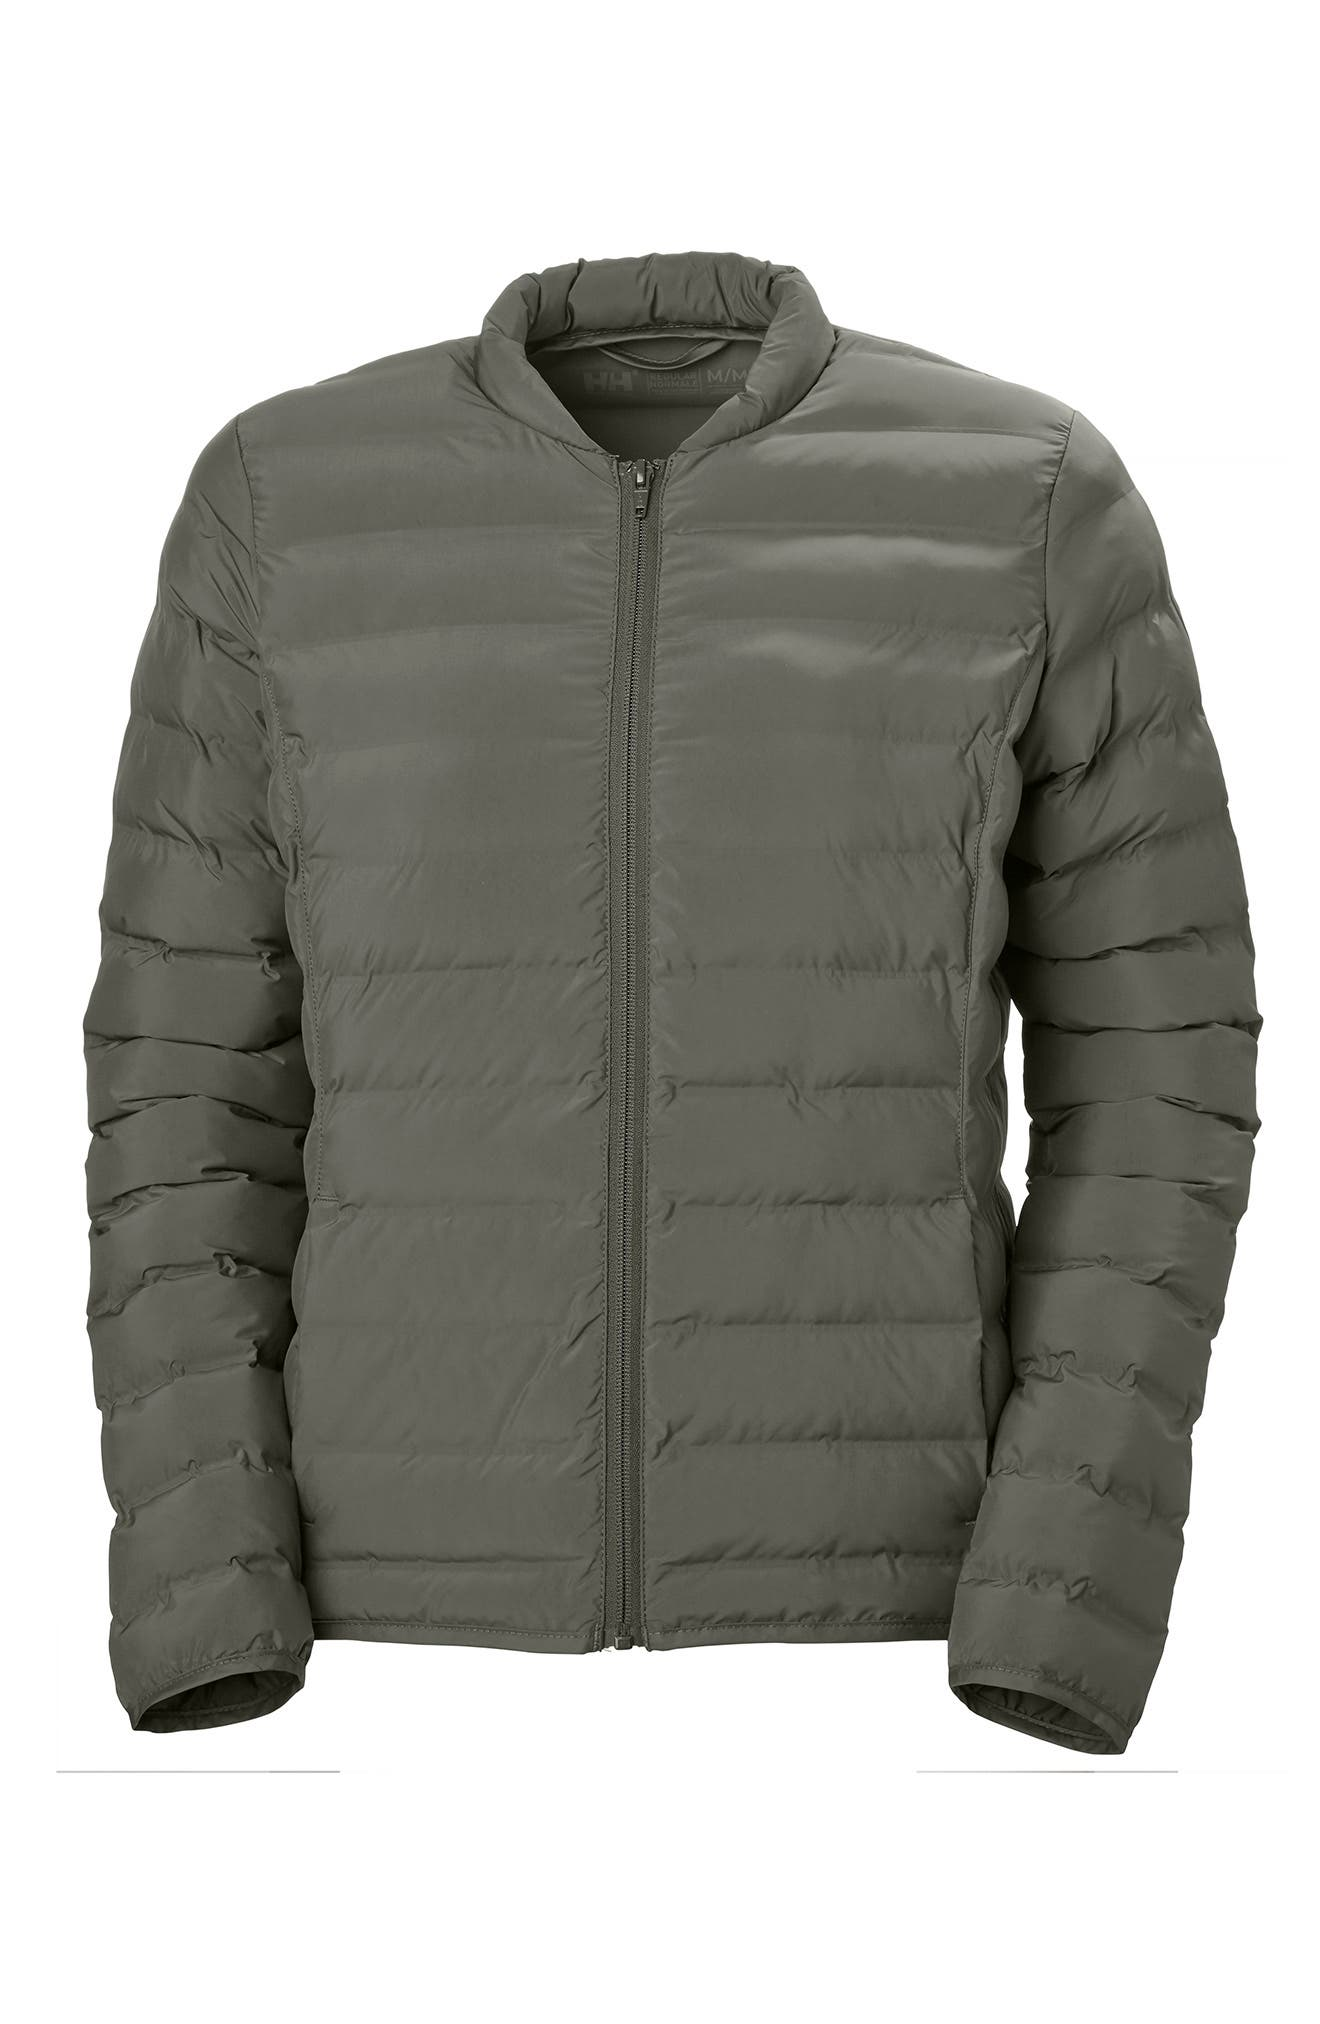 Urban Liner Puffer Jacket